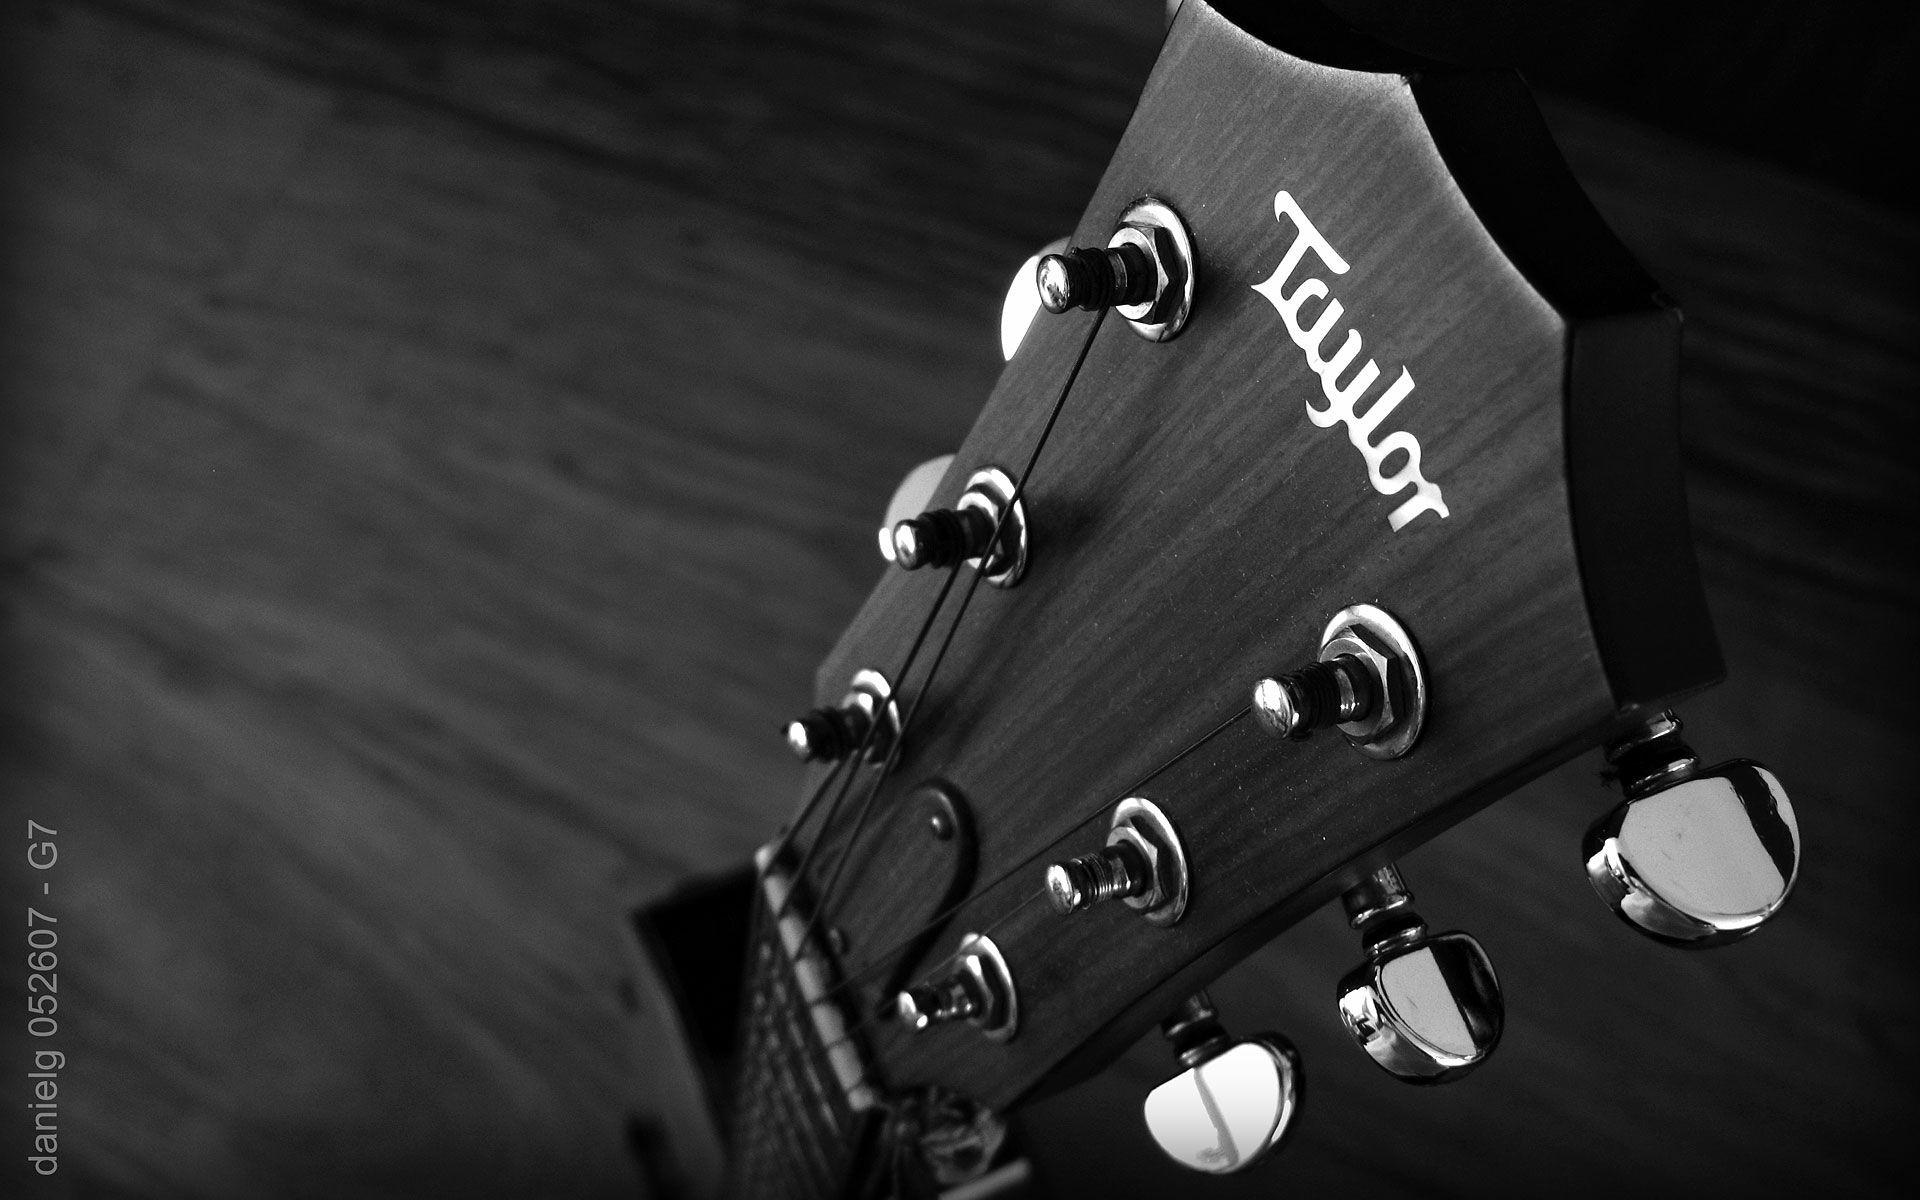 Neon lights guitar wallpaper (1280×800) | Wallpapers | Pinterest | Neon  lighting and Guitars